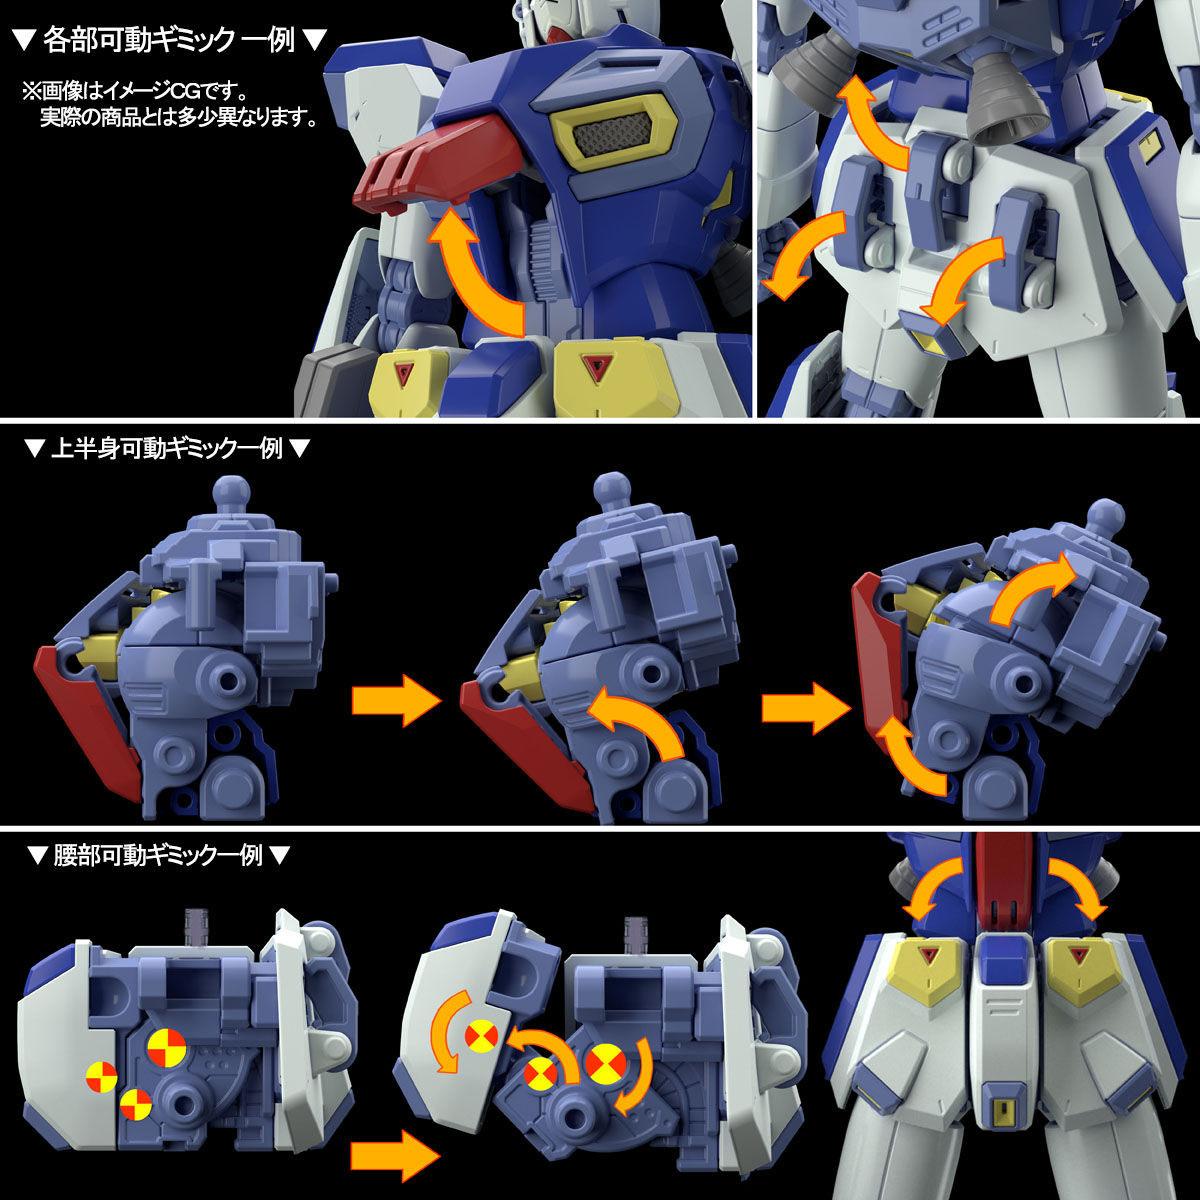 MG 1/100『ガンダムF90』プラモデル-010